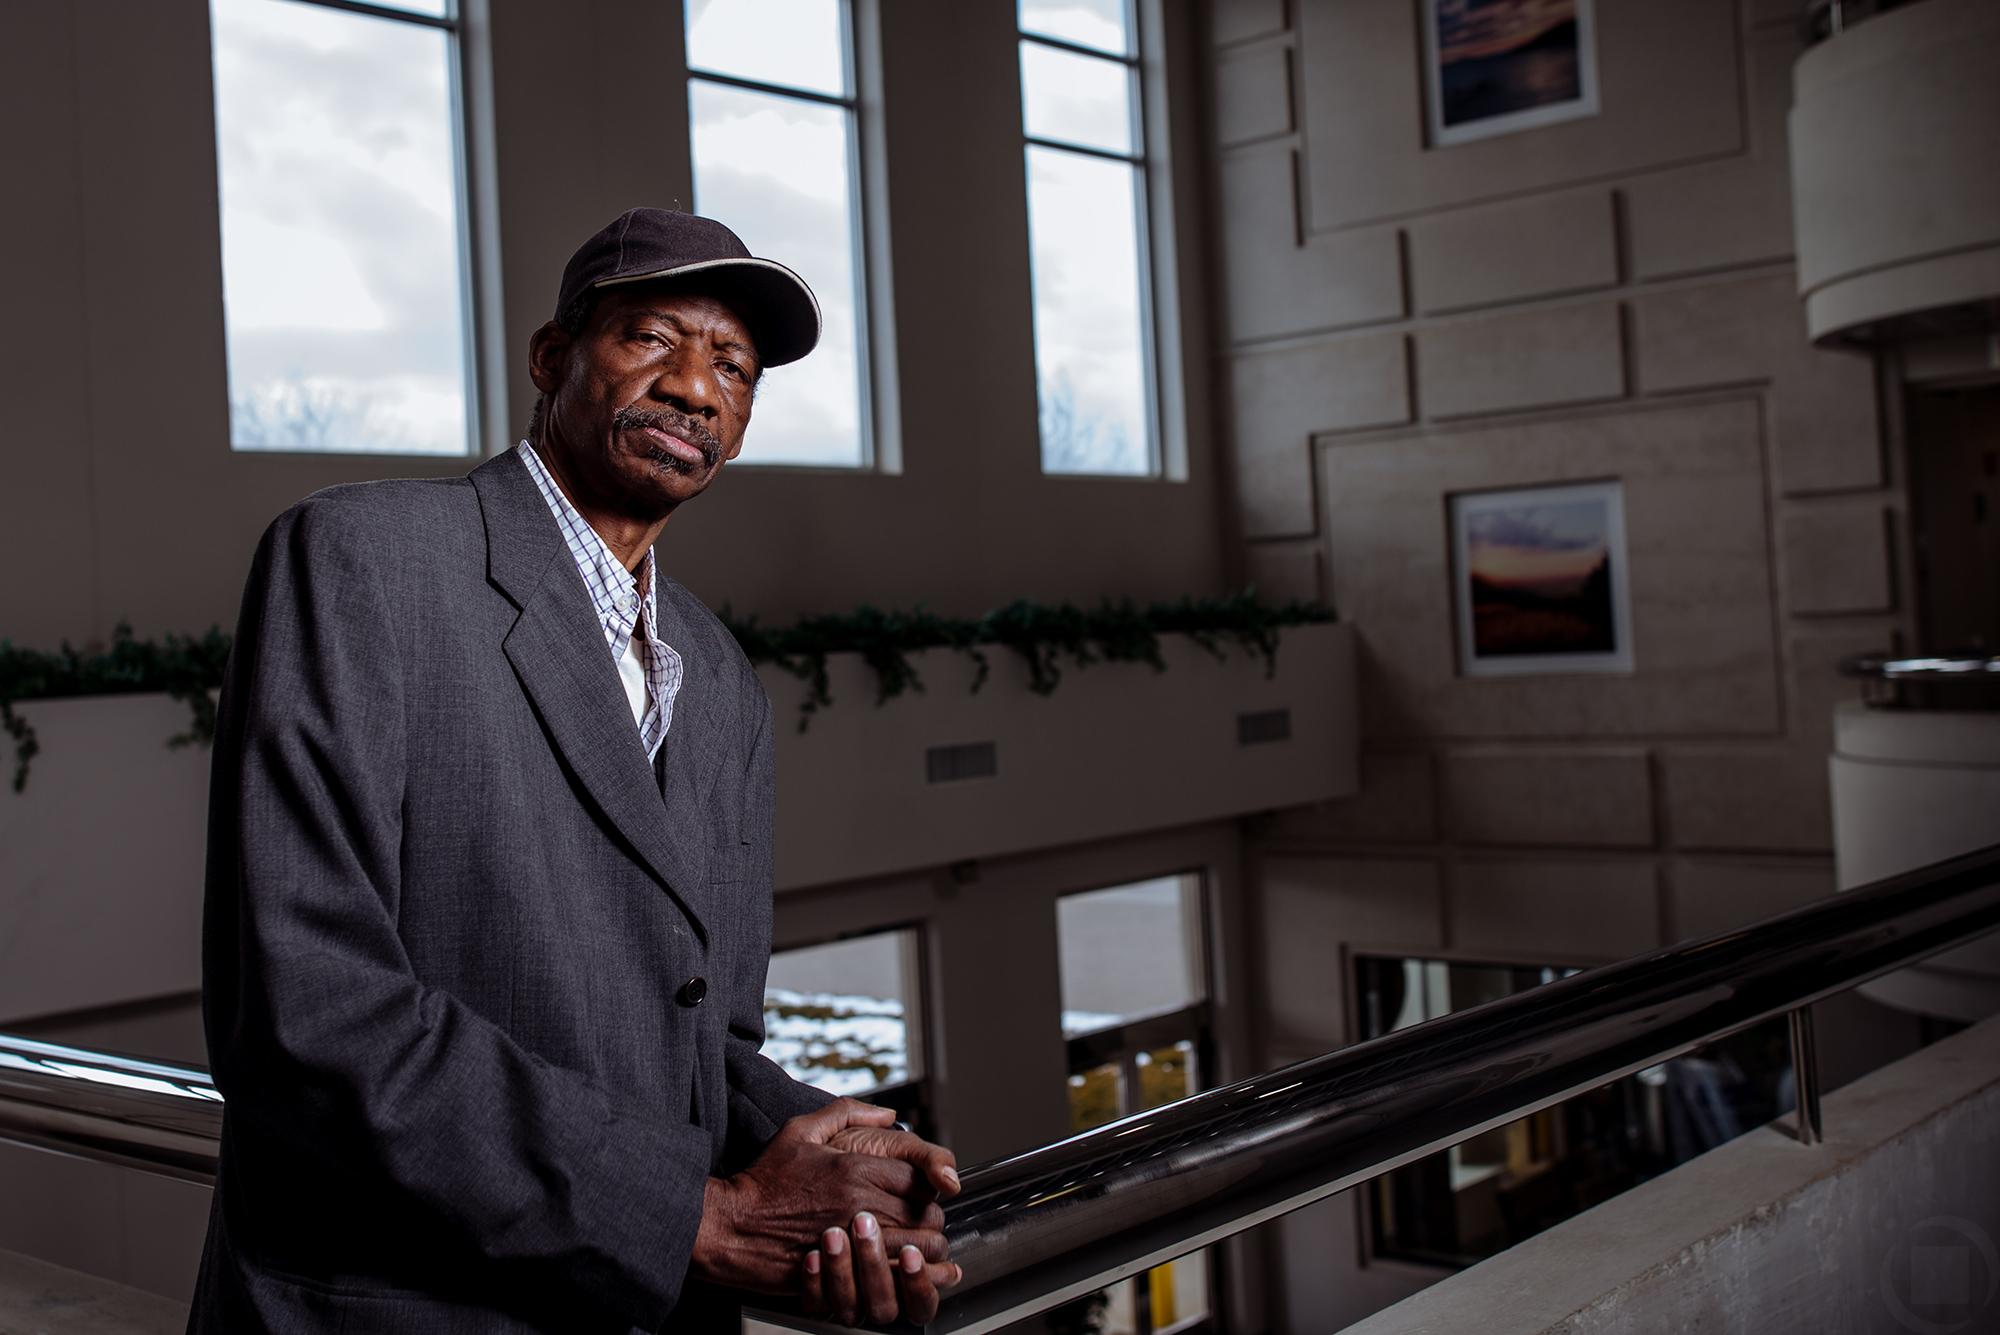 balcony african american man baseball hat suit coat